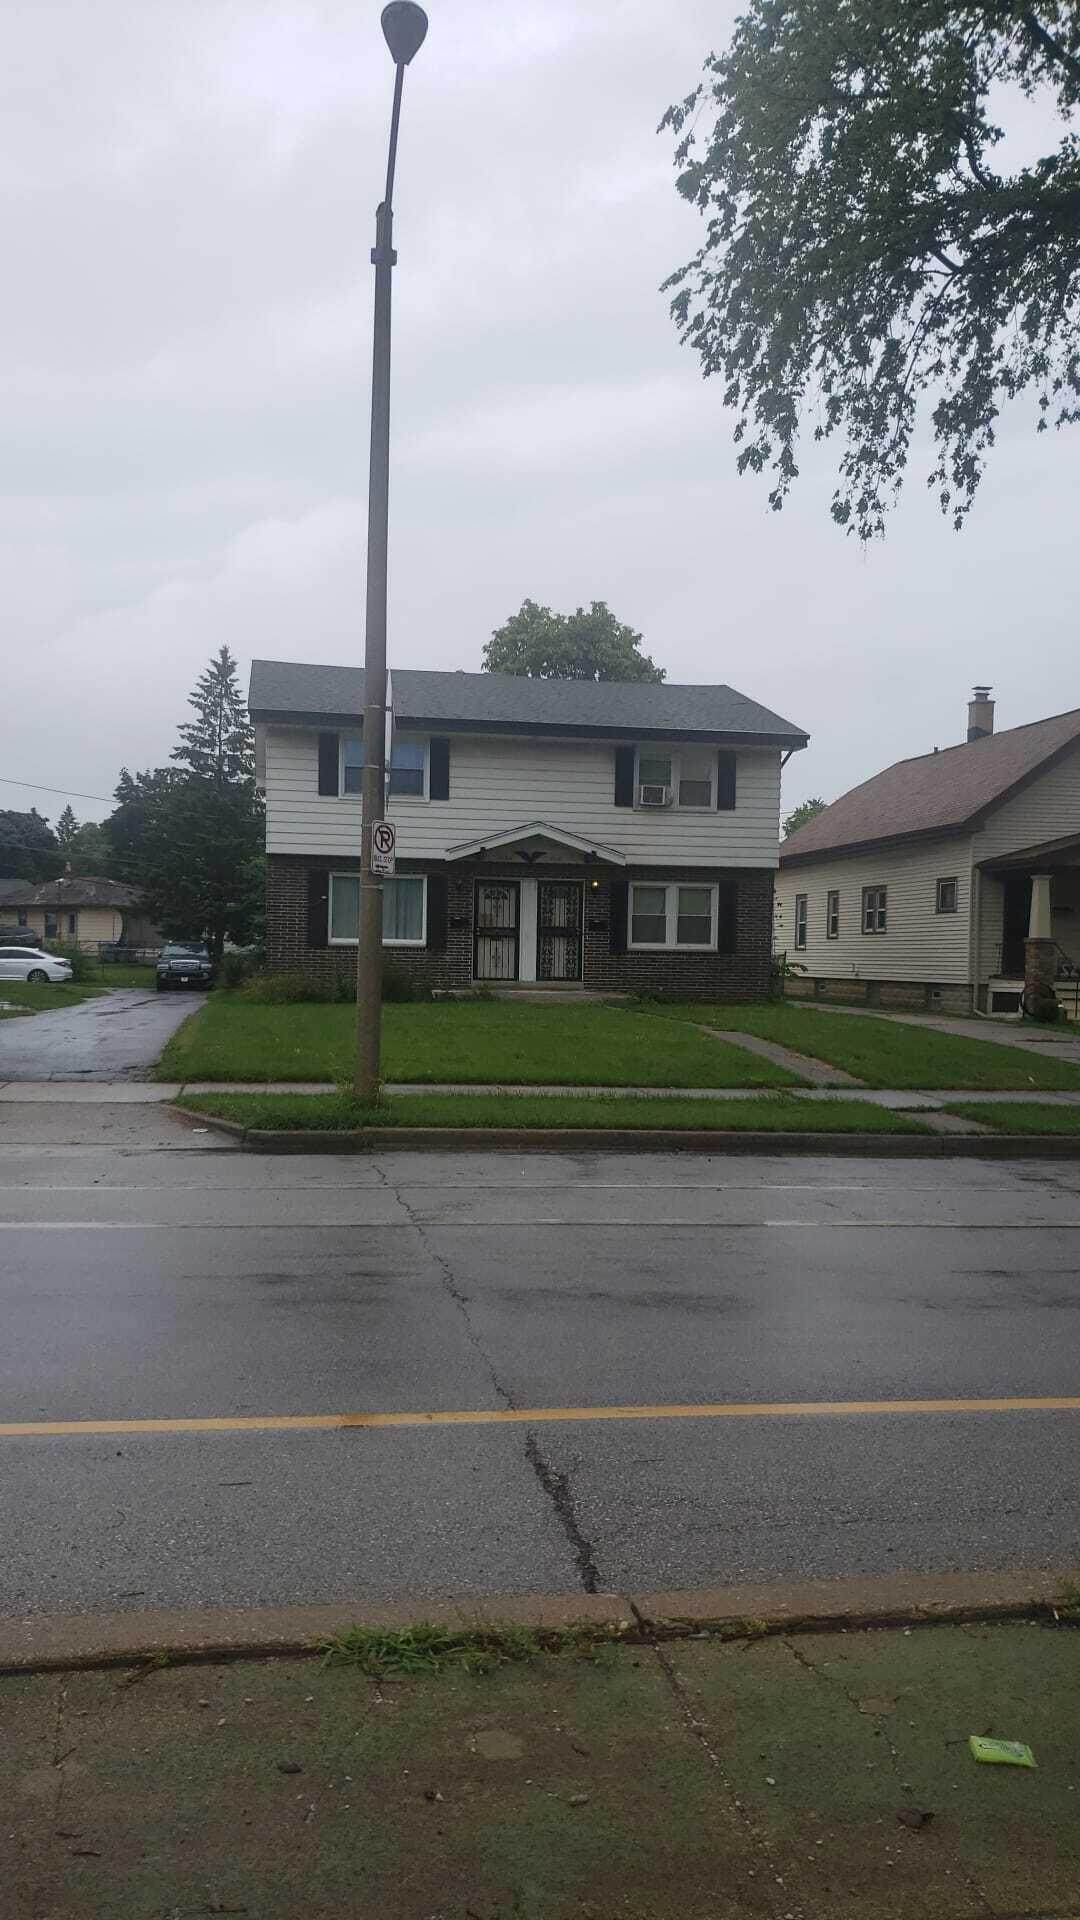 7118 Villard Ave - Photo 1